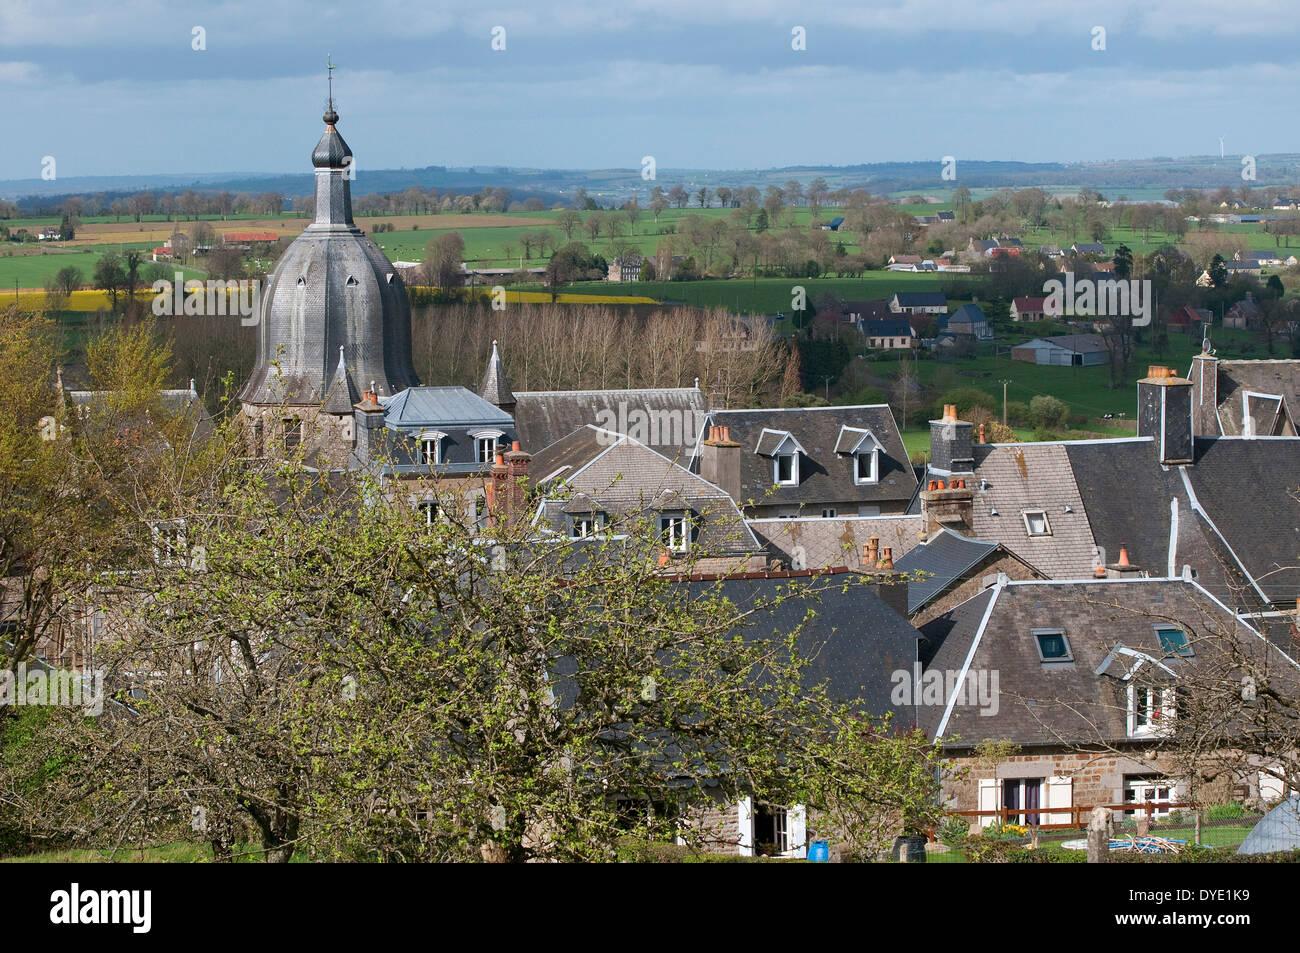 st sever calvados region, normandy, france - Stock Image